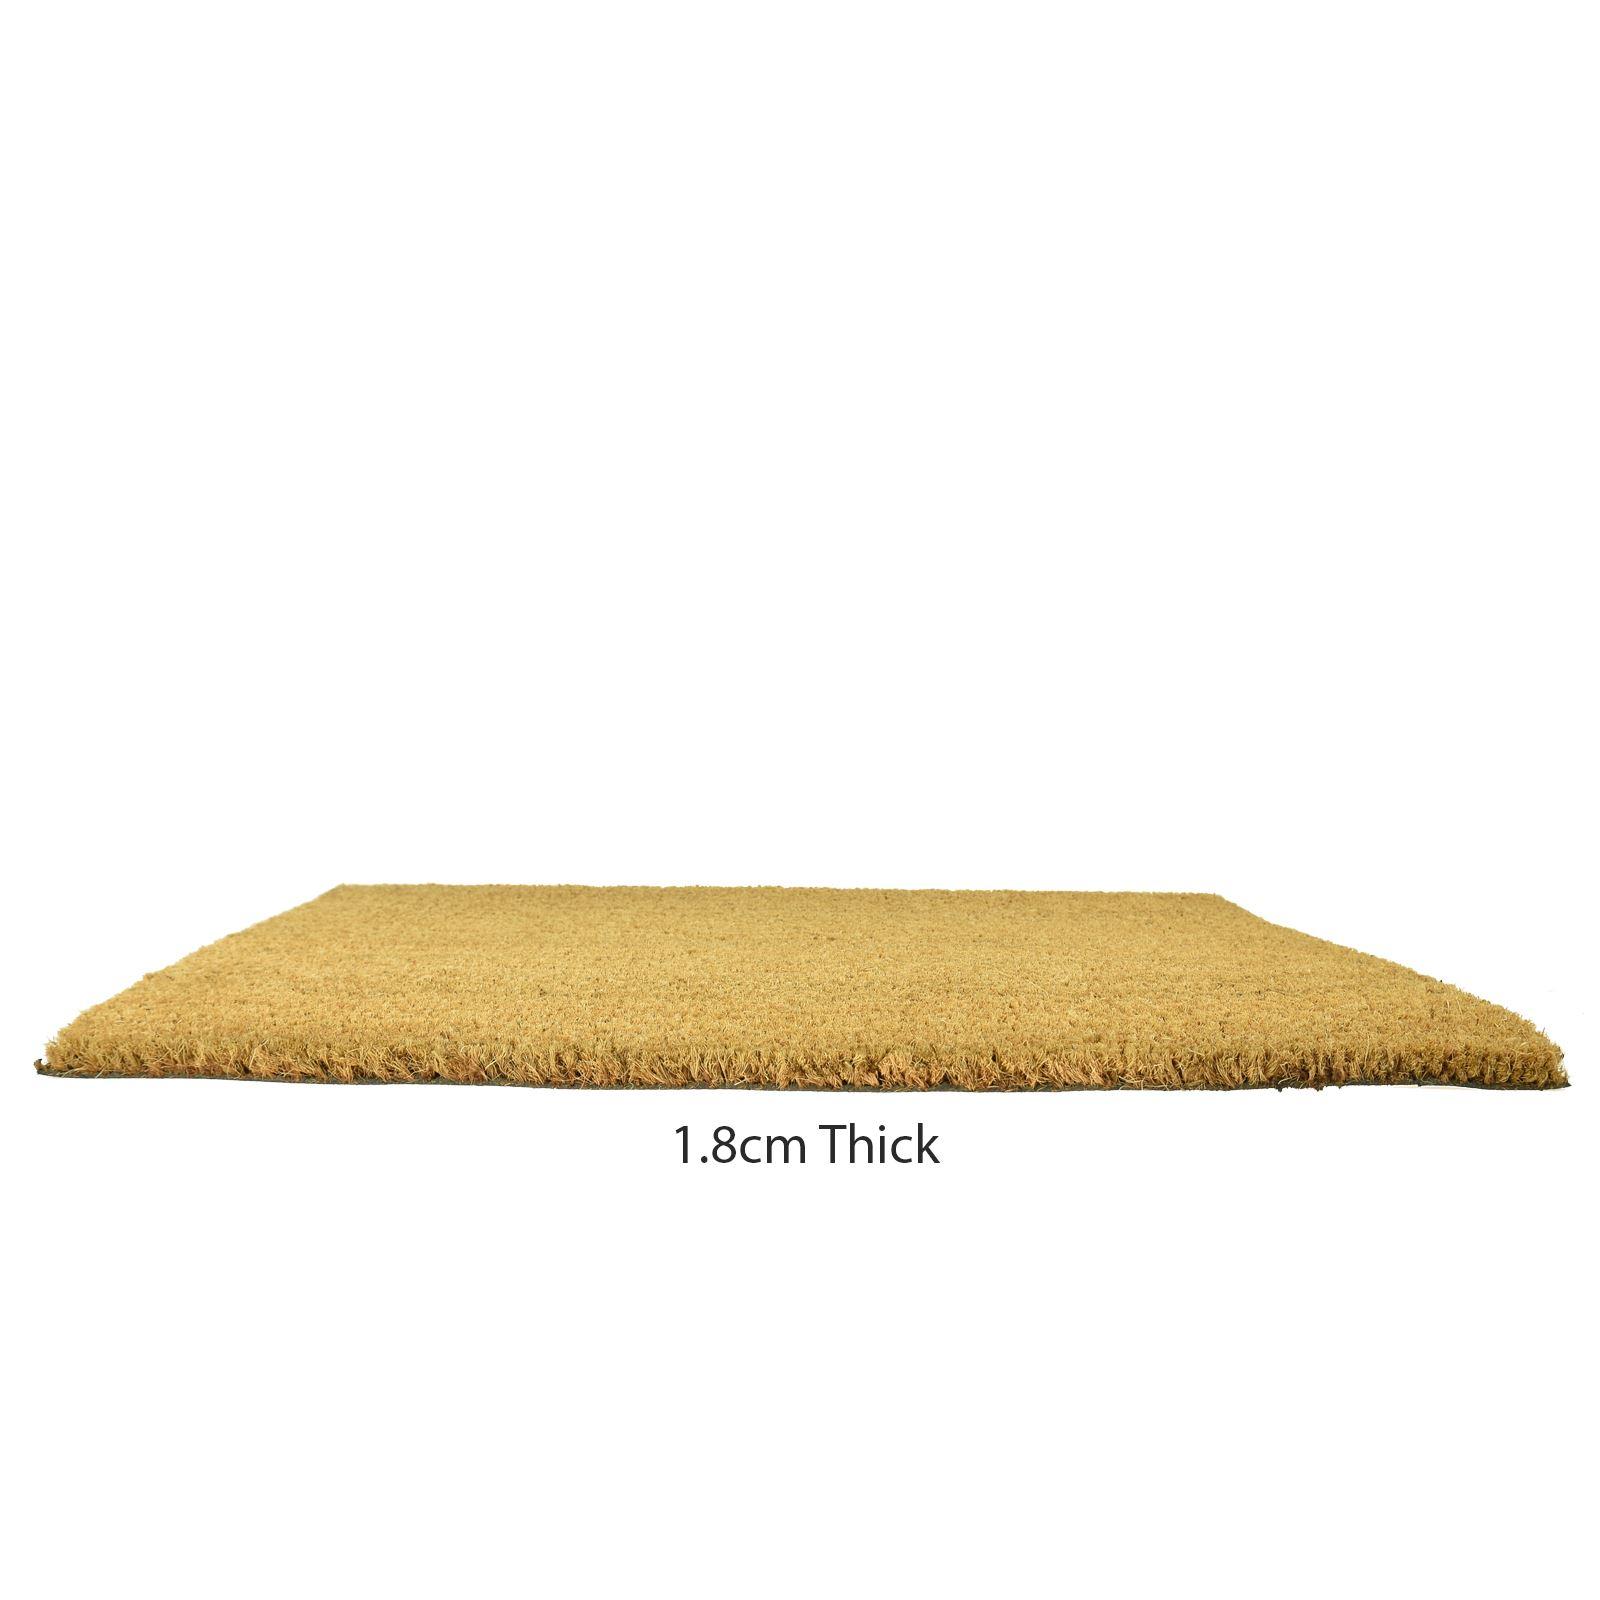 Plain-Non-Slip-Door-Mat-Tough-Natural-Coir-PVC-Back-Welcome-Doormat-40-x-60cm miniatura 98